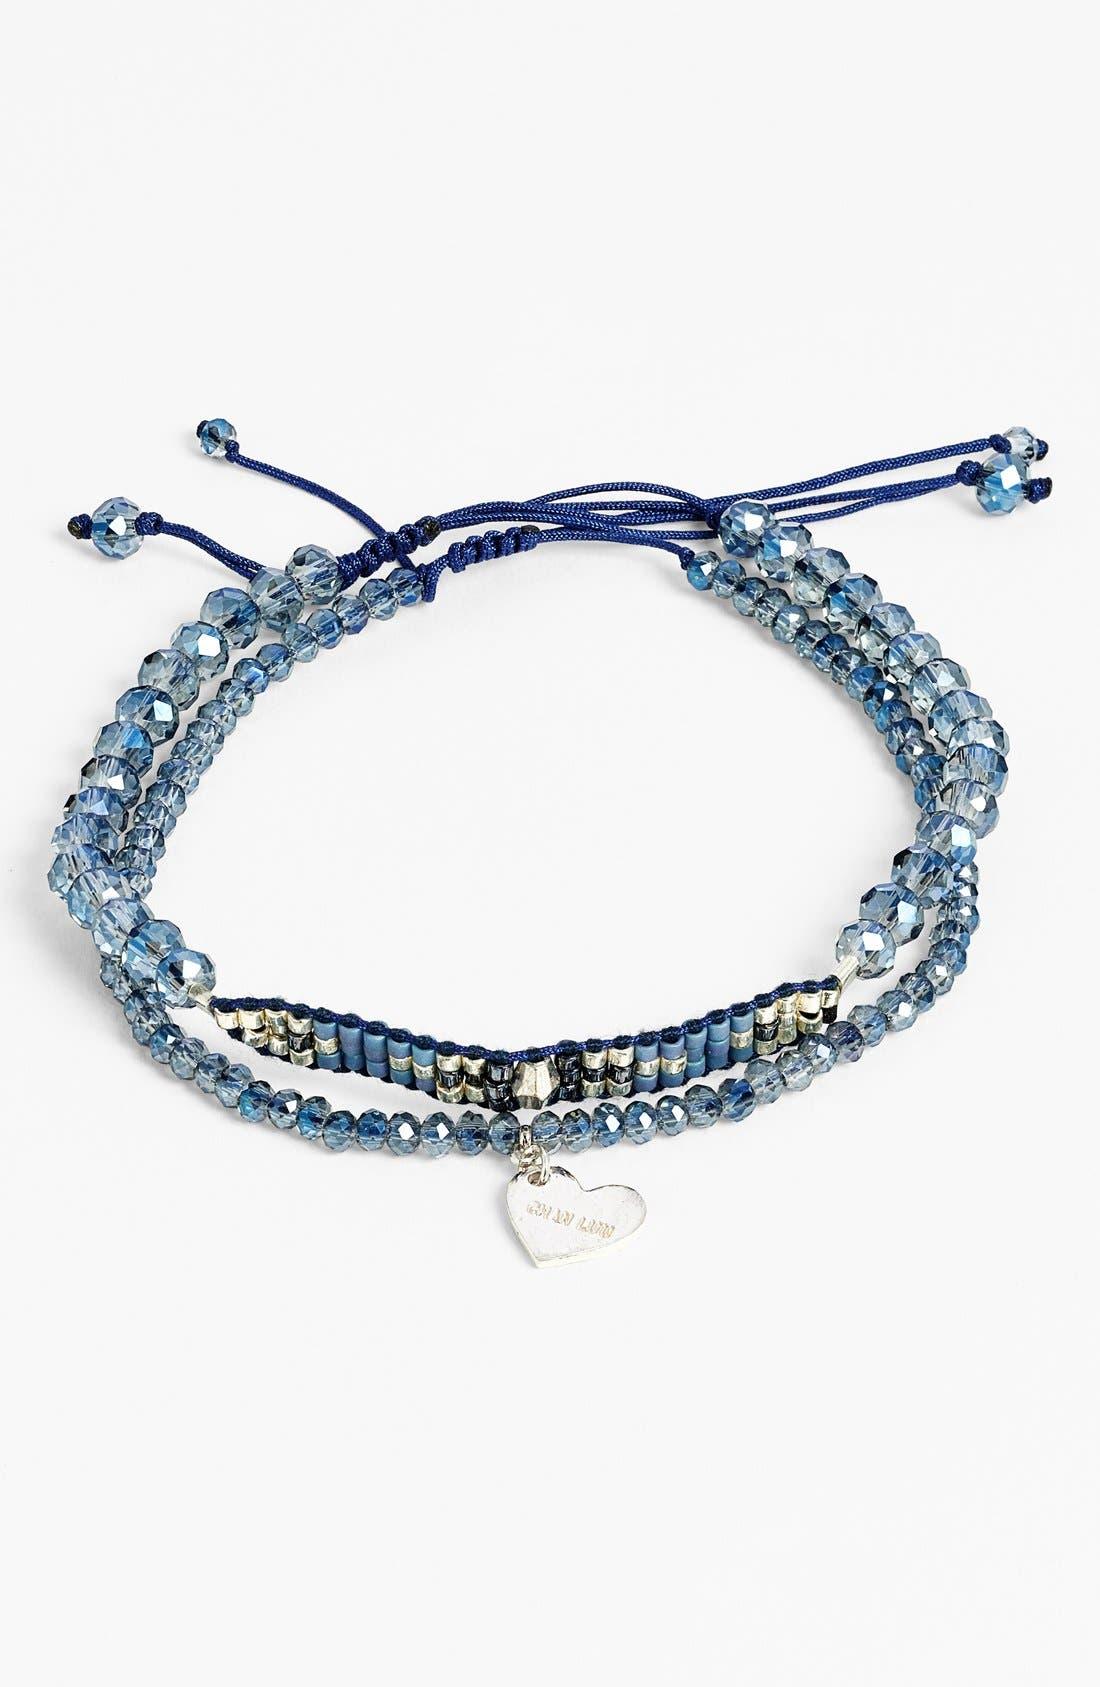 Alternate Image 1 Selected - Chan Luu Beaded Adjustable Bracelets (Set of 2)